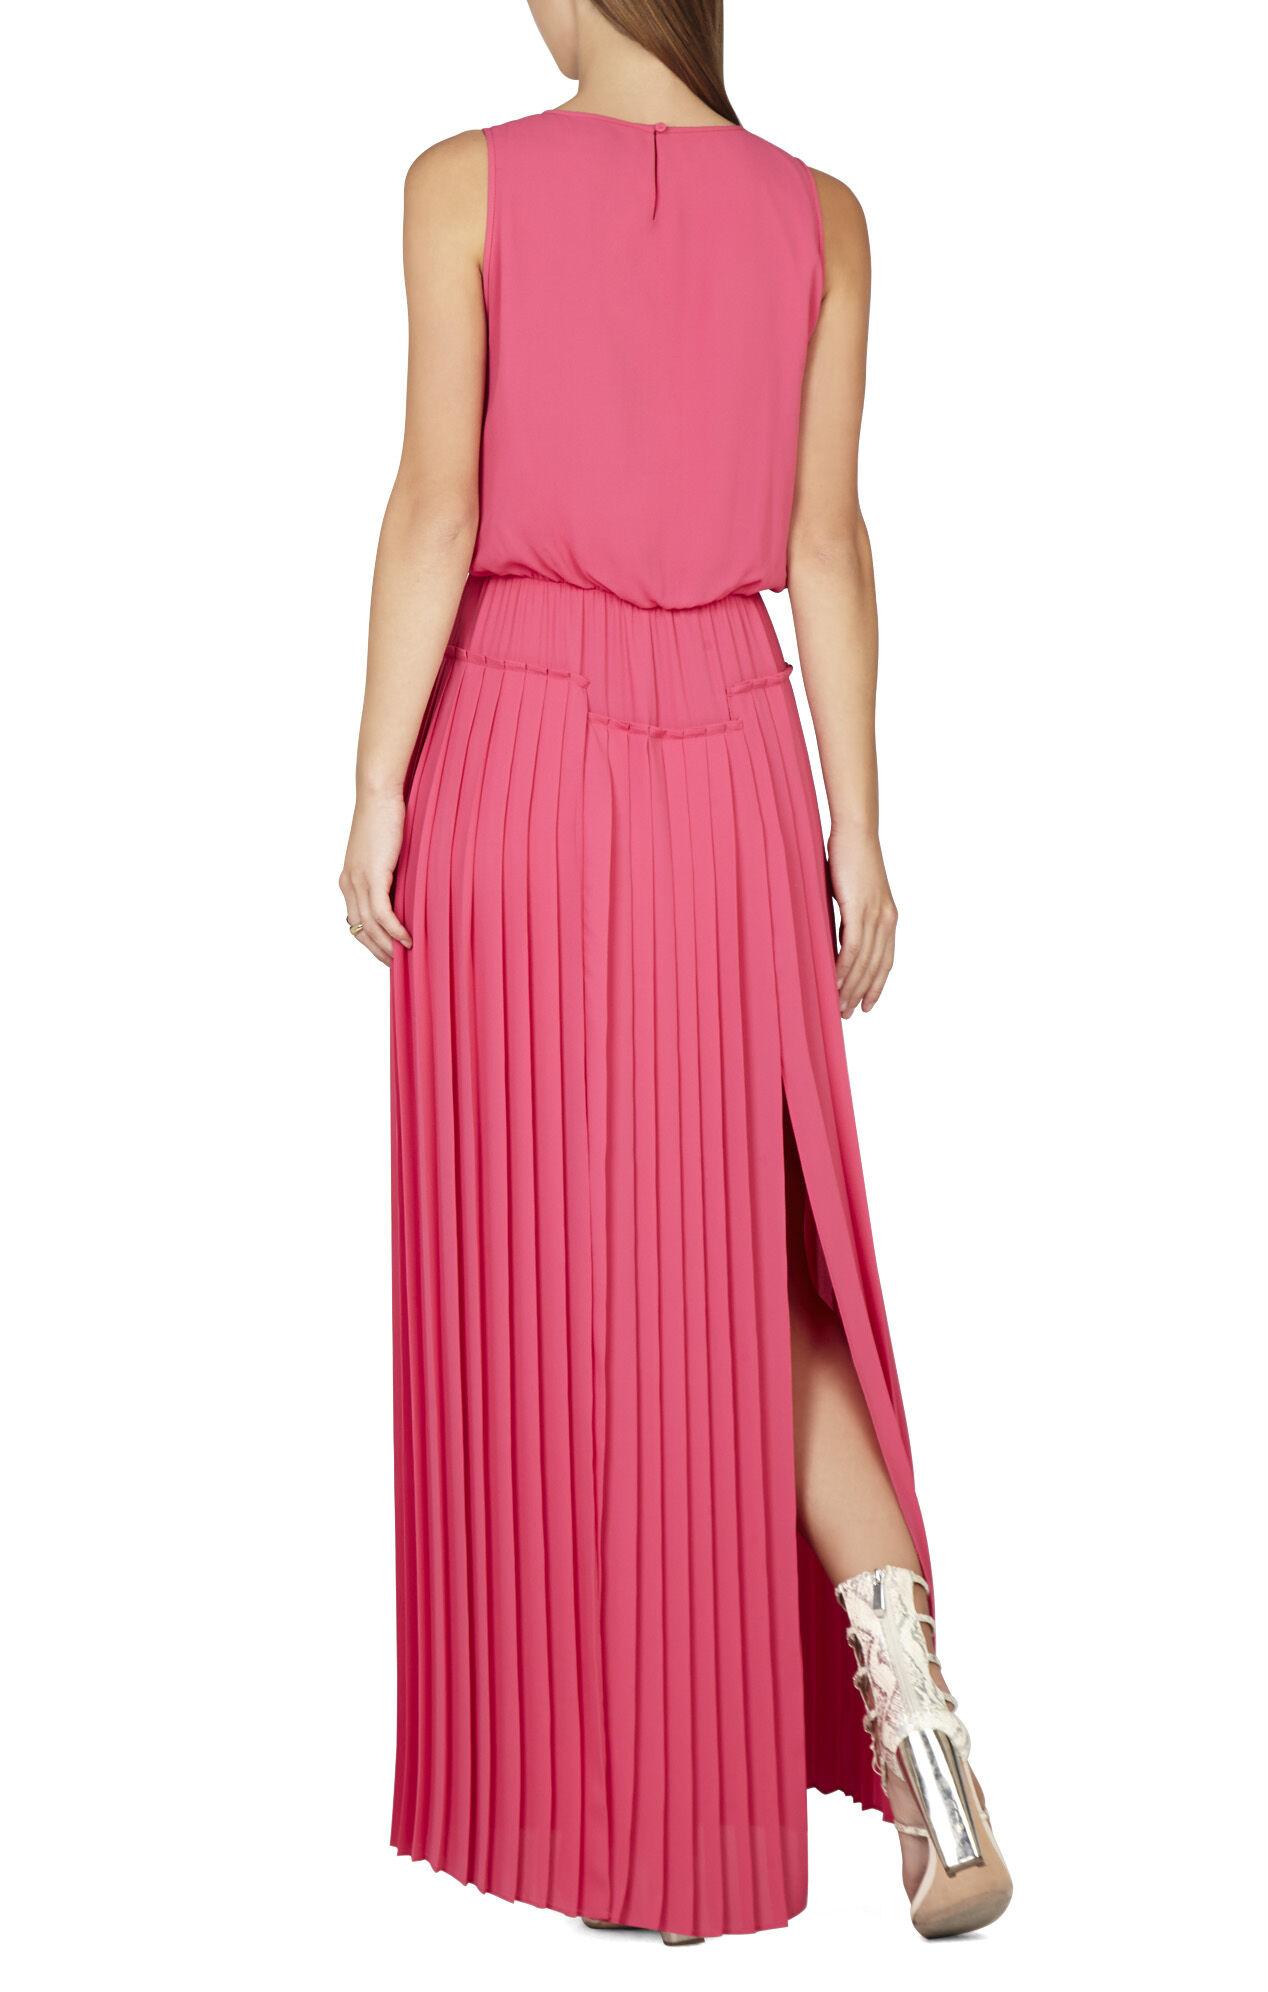 Jenine High-Slit Pleated Skirt Maxi Dress